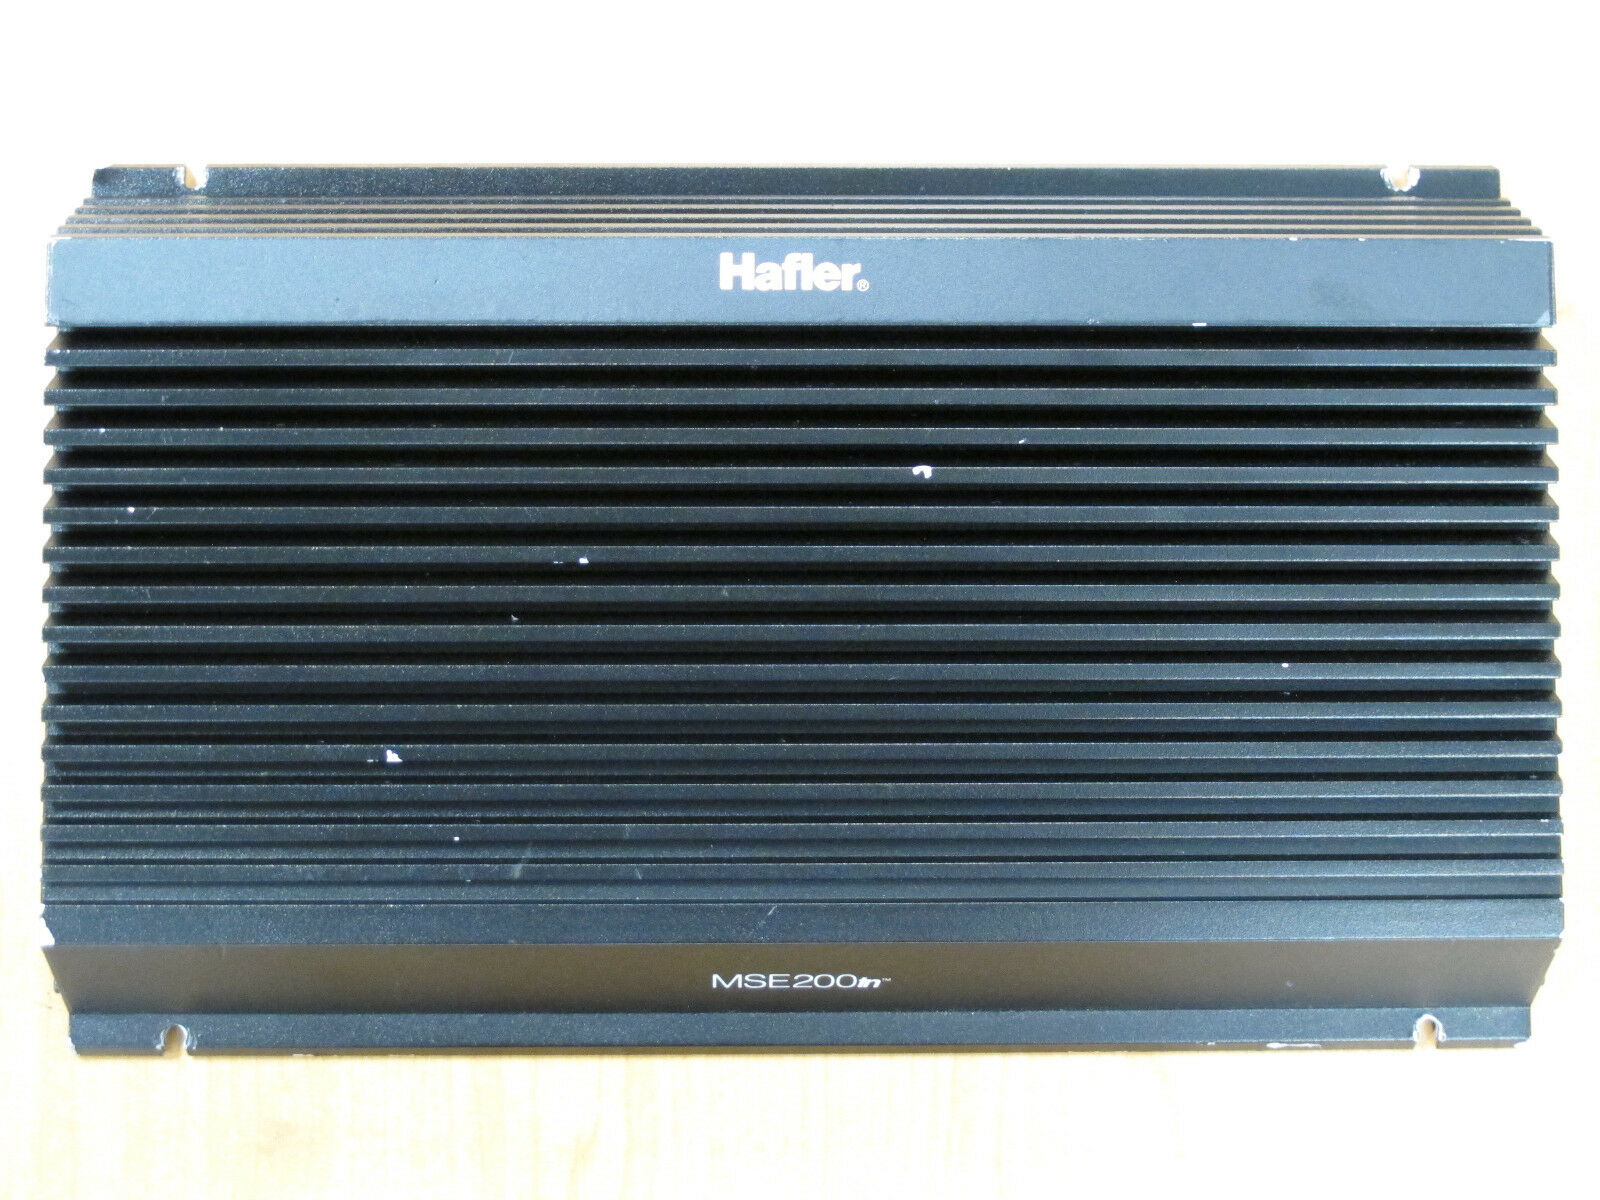 Hafler MSE 200tn 200tn 200tn Amp por Rockford Fosgate e8f90d